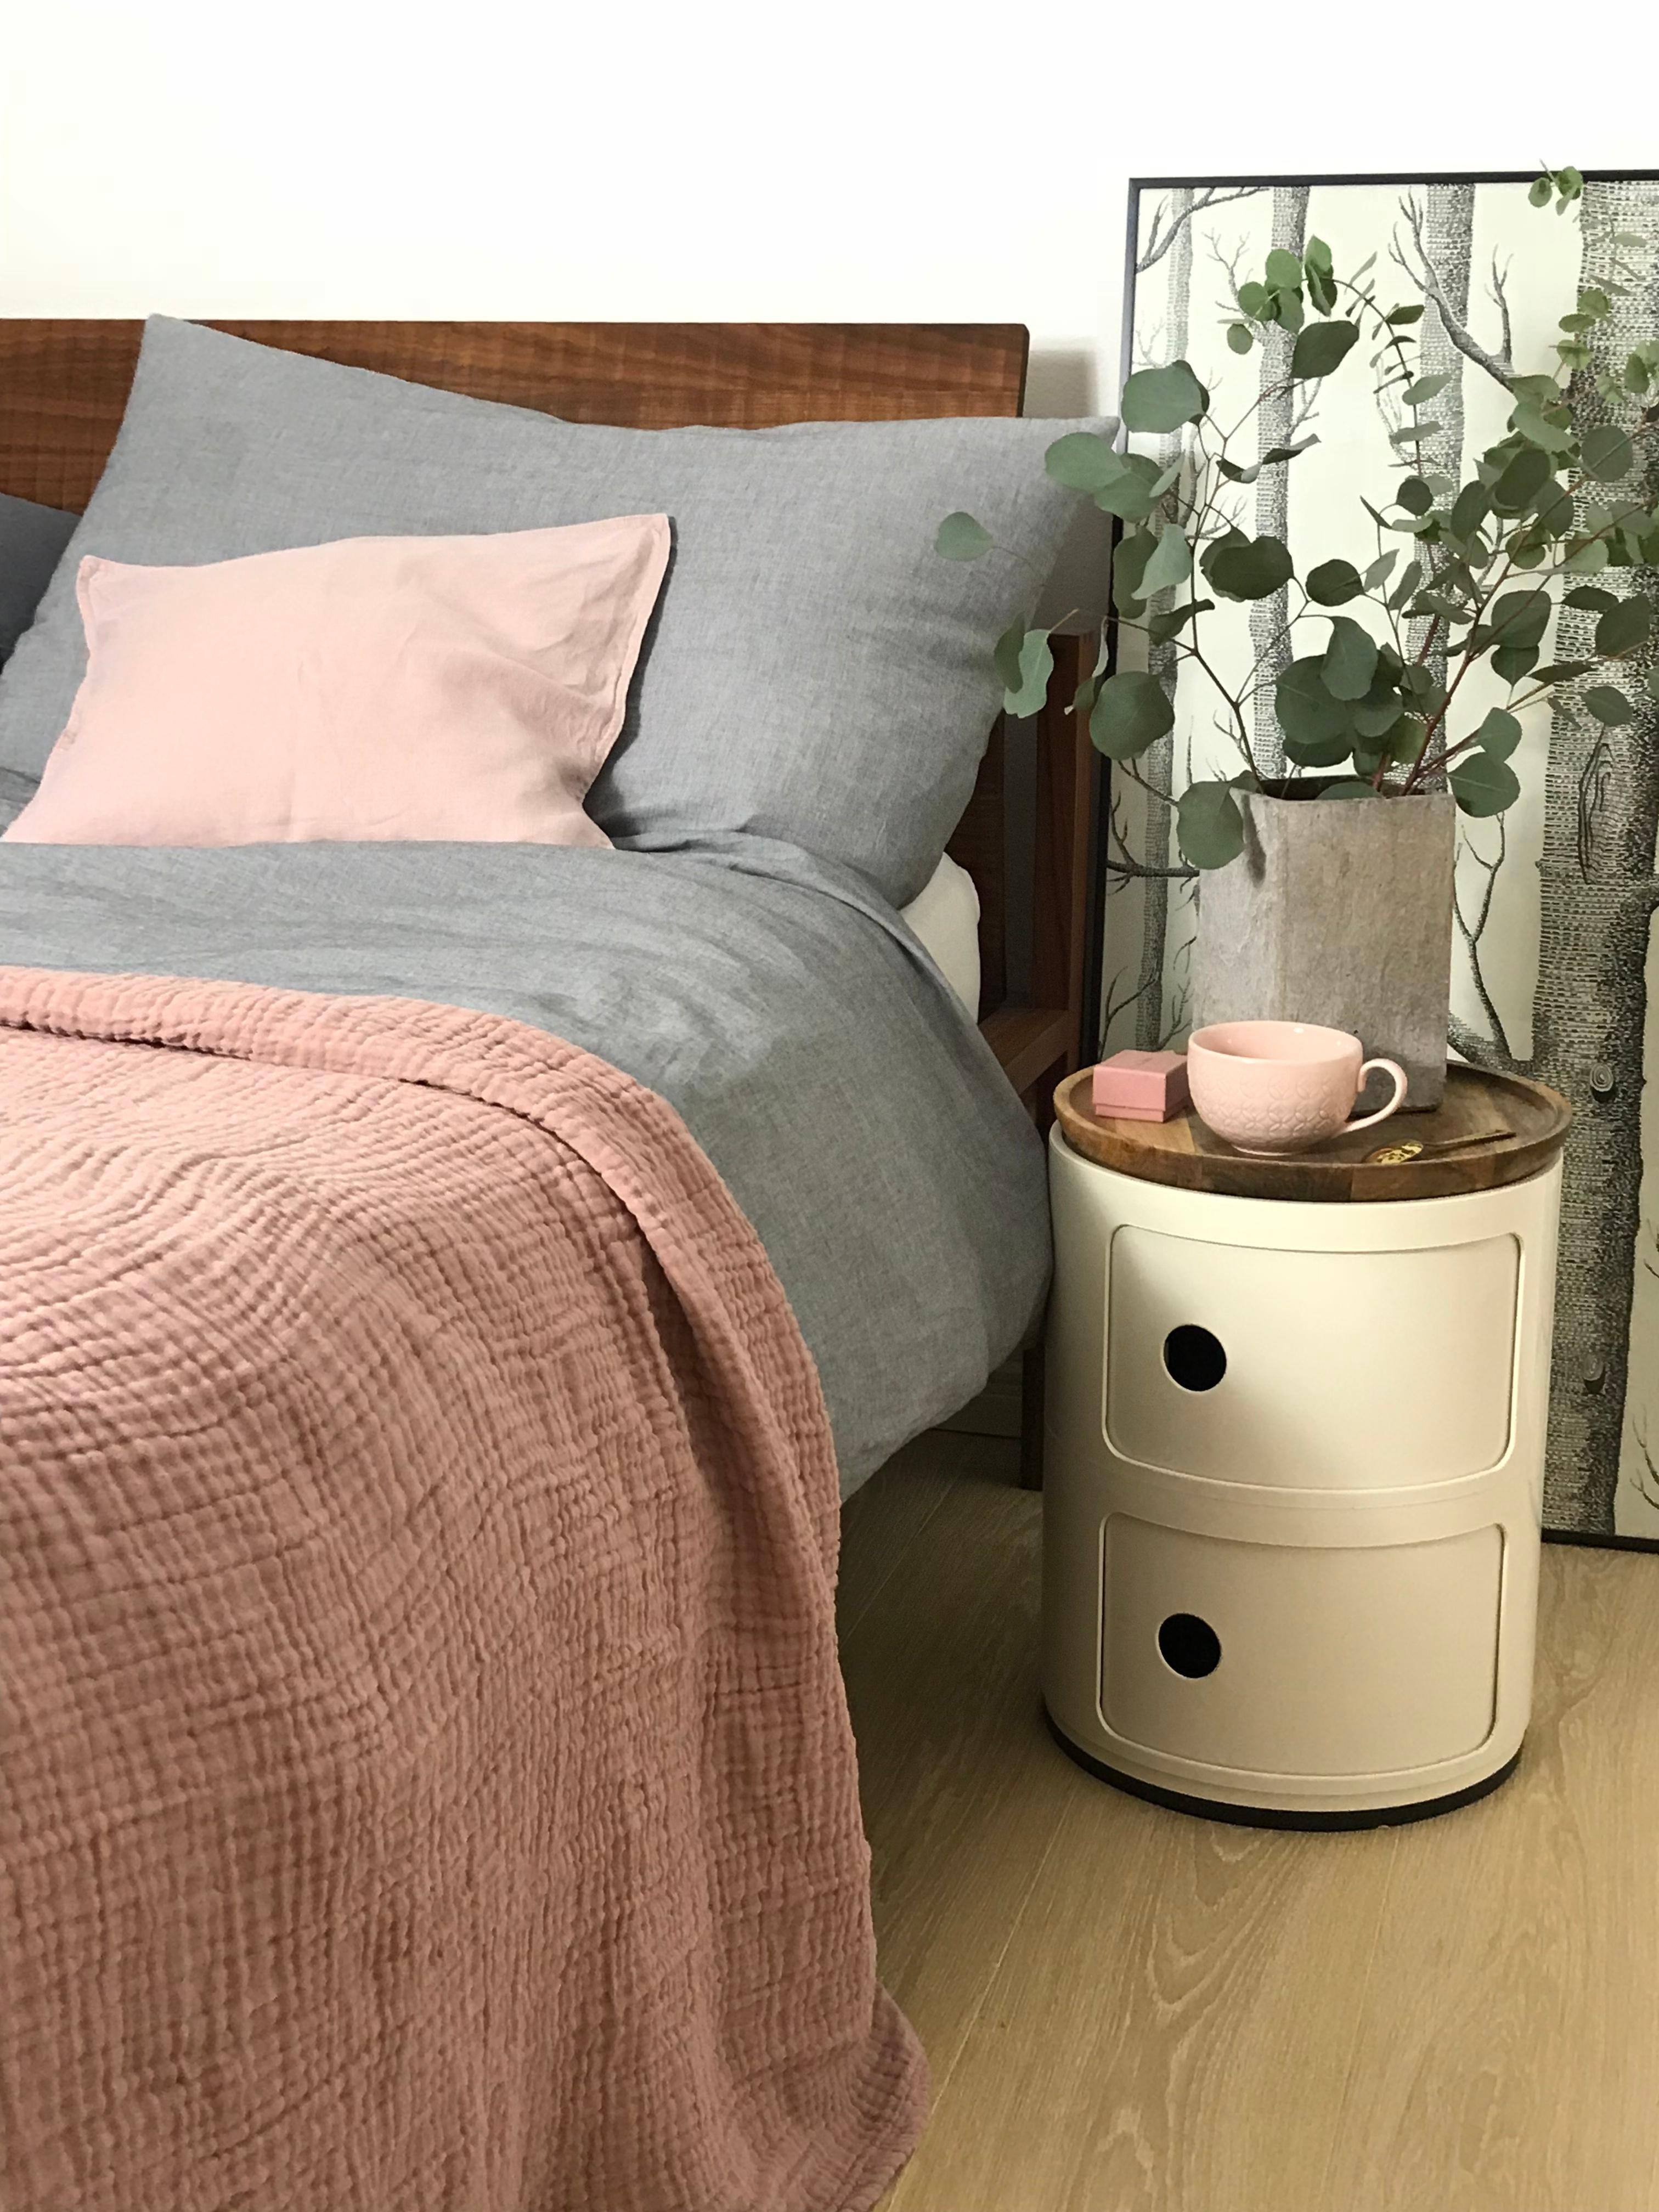 #schlafzimmer #bett #rosa#grau